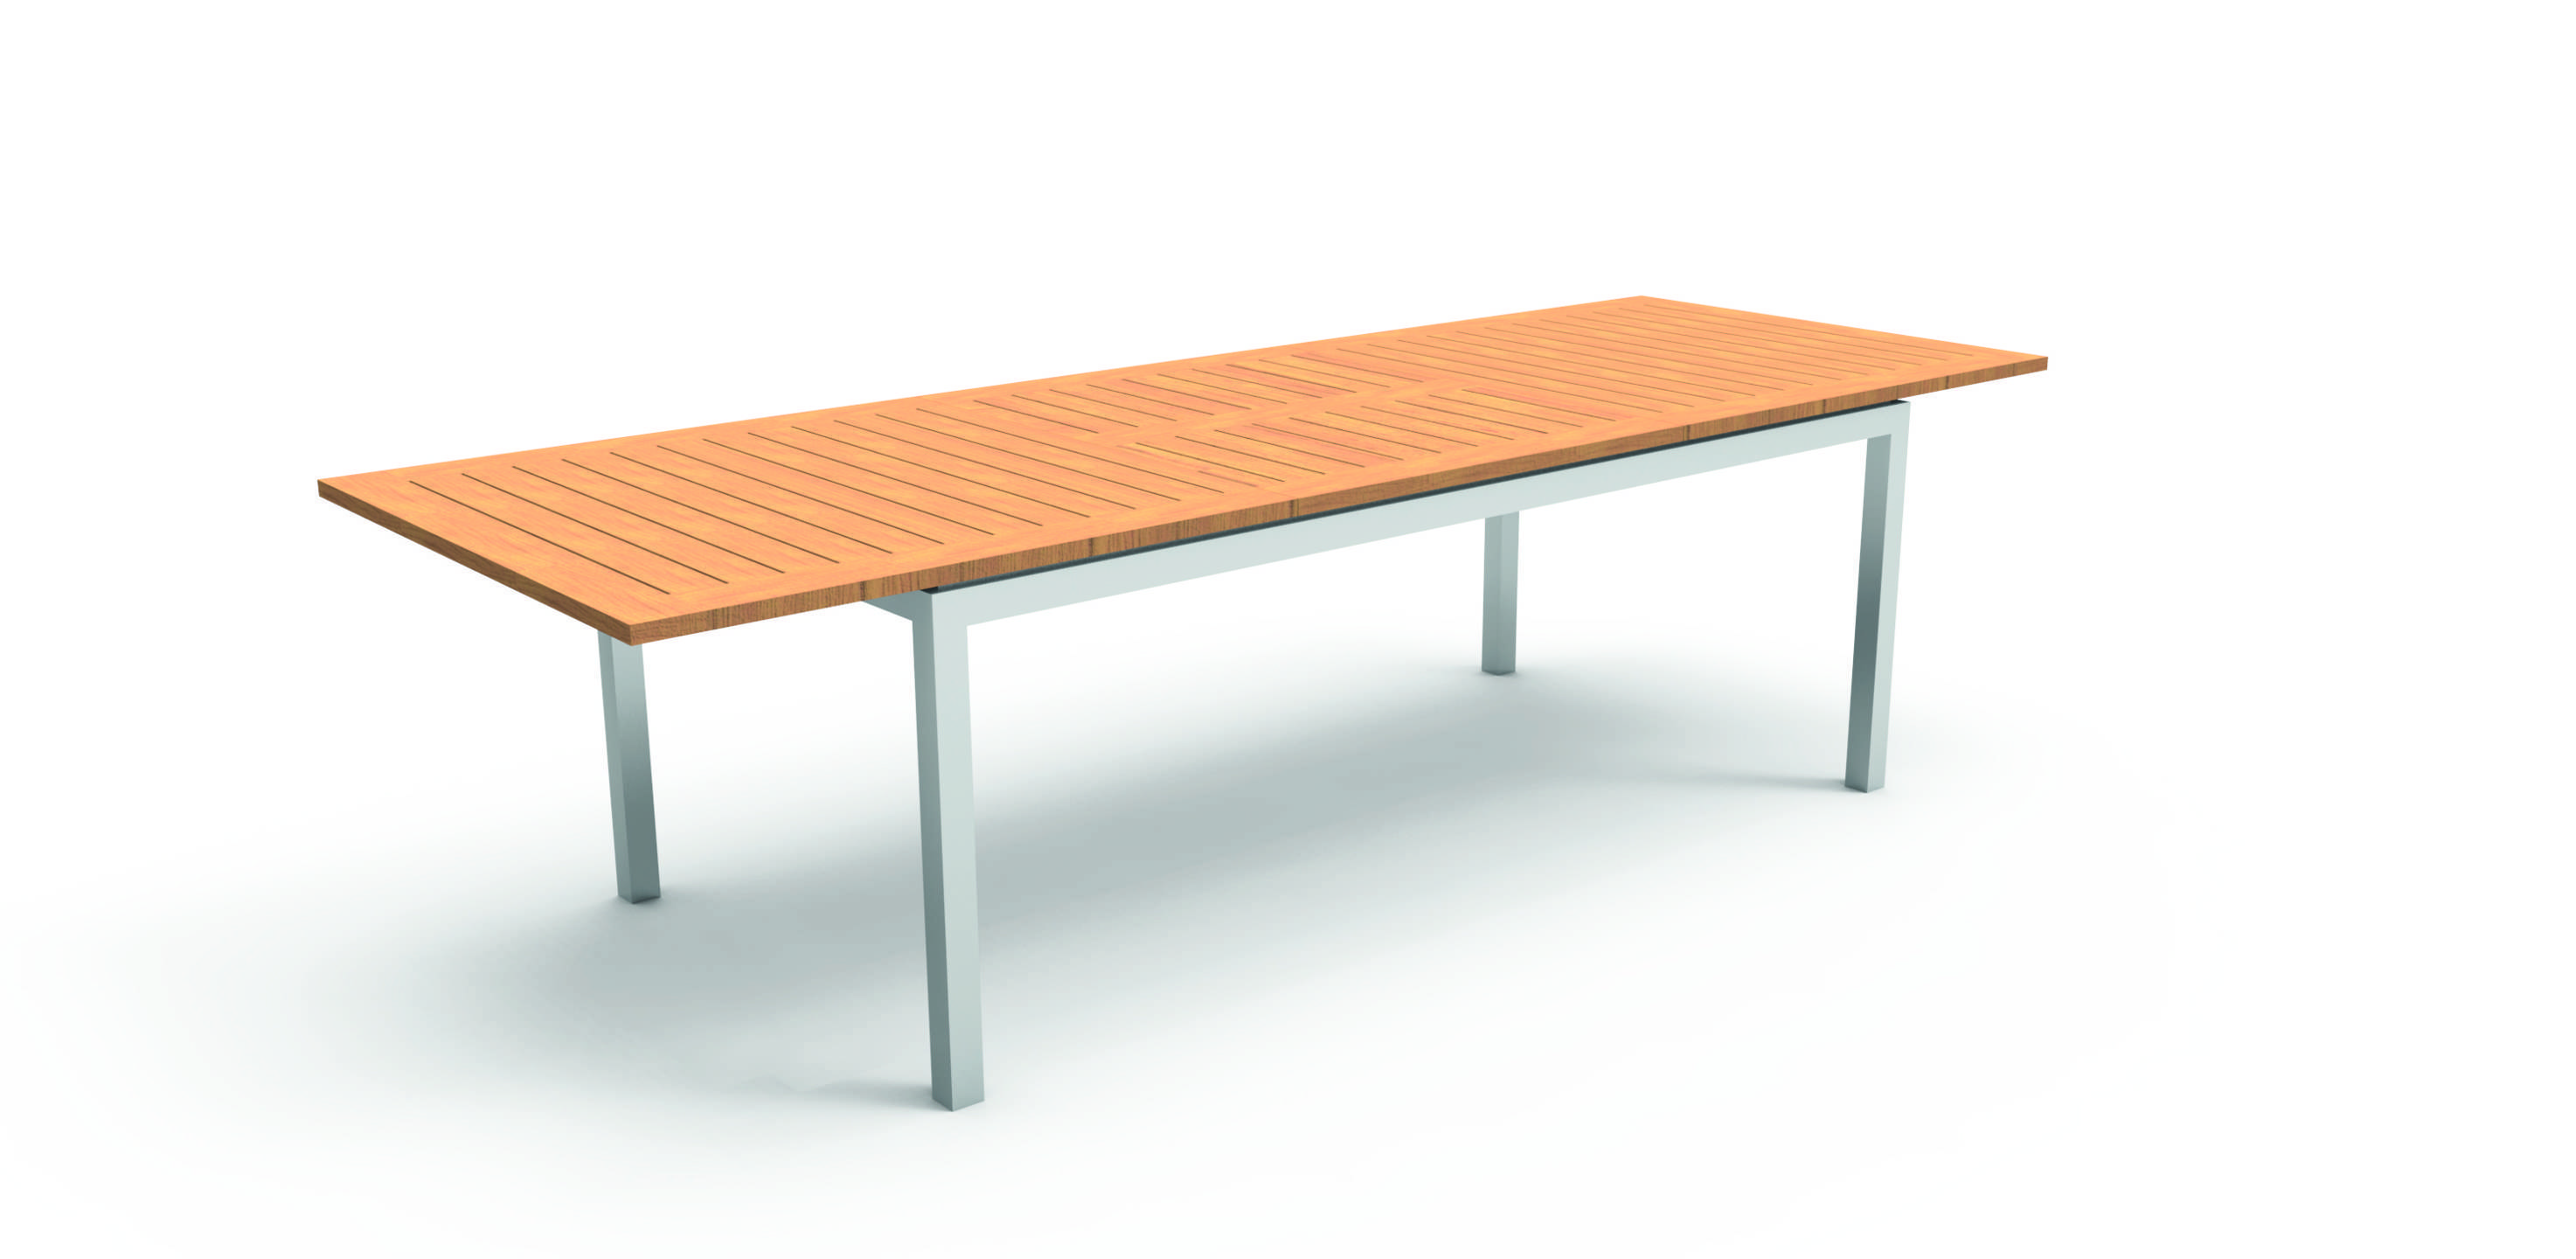 Vivereverde tavolo pranzo 200 280 timbercollection - Emu tavoli da giardino ...